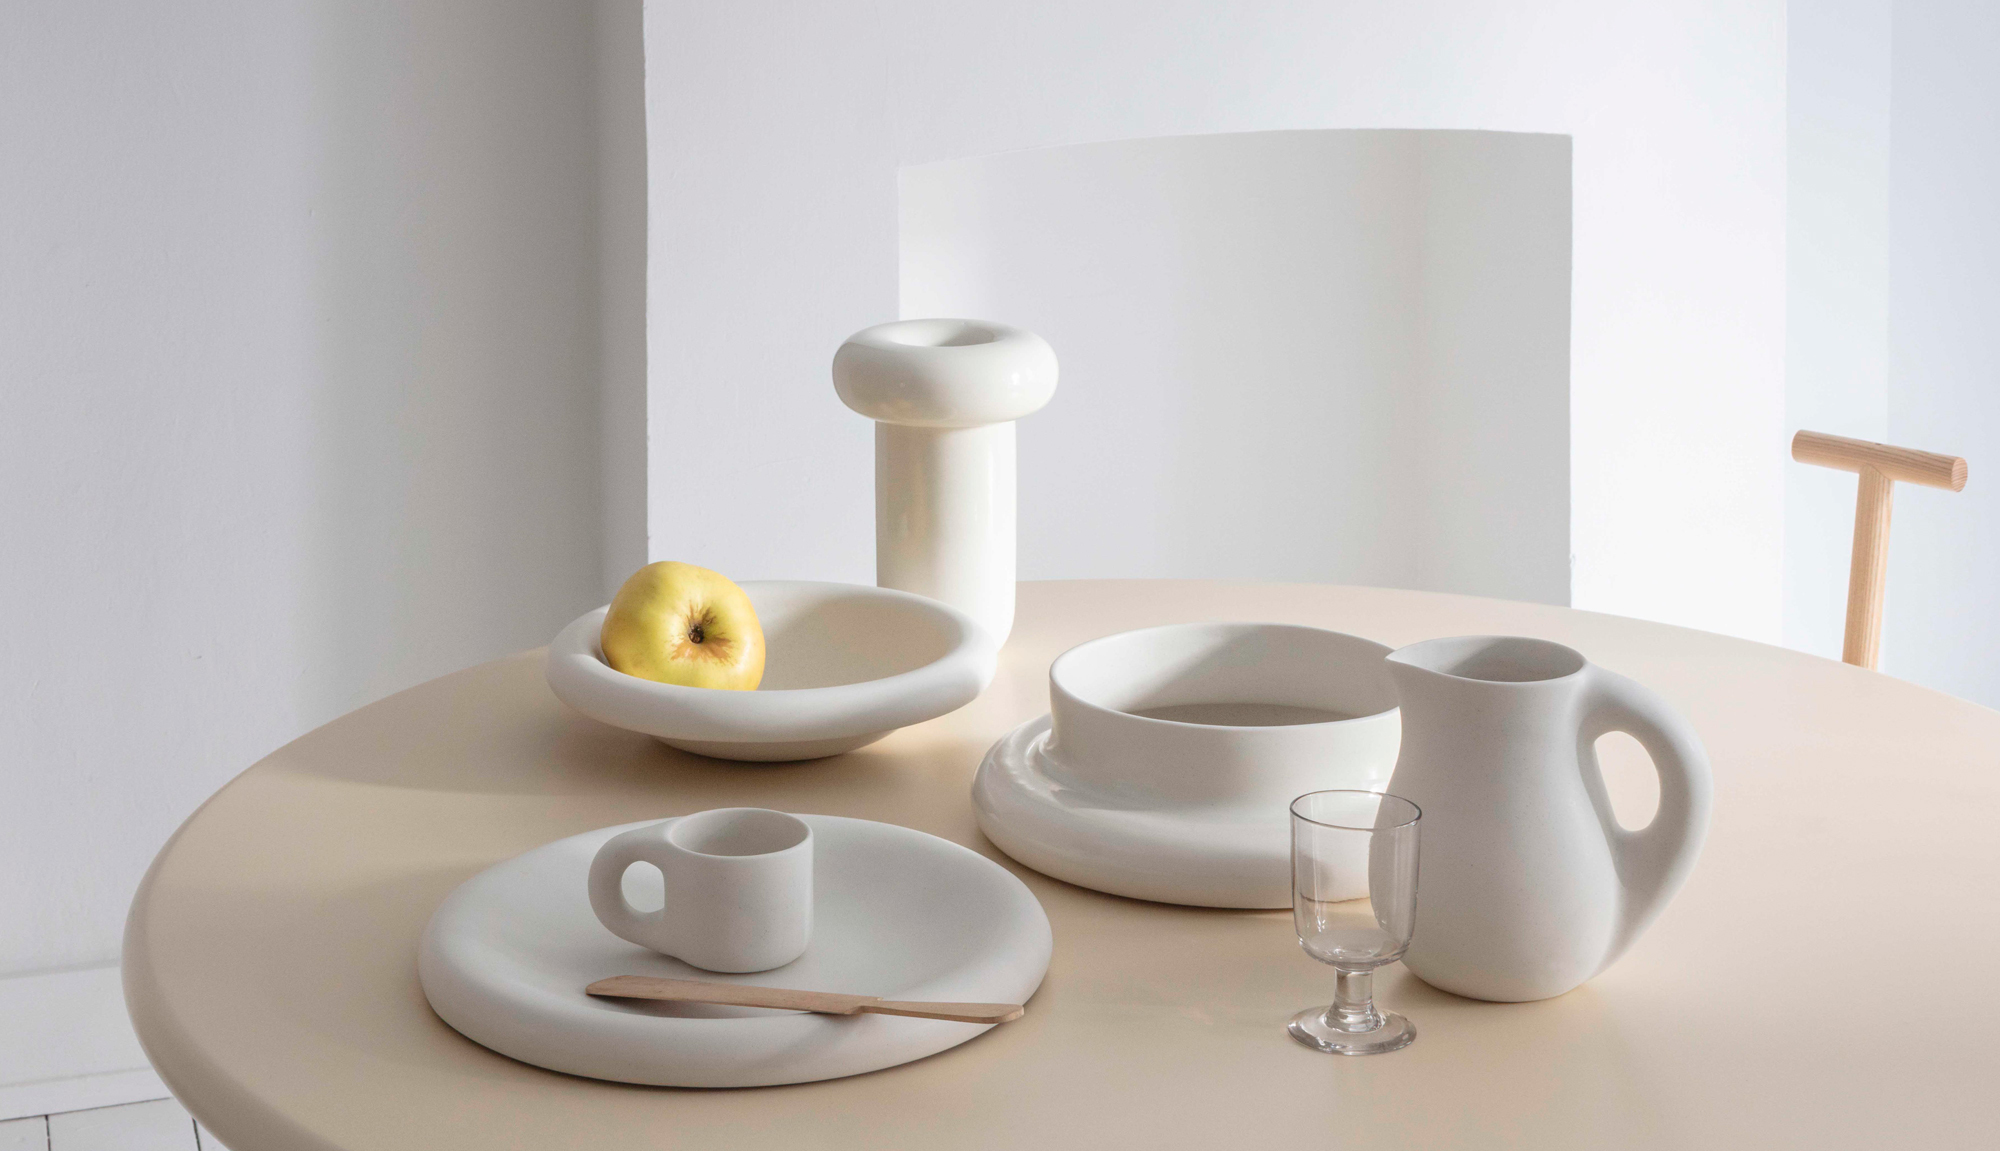 Trend #1: Rough-Style & Keramik-LookKeramik-Kollektion Dough von Toogood. Foto/ Copyright: Matthew Donaldson